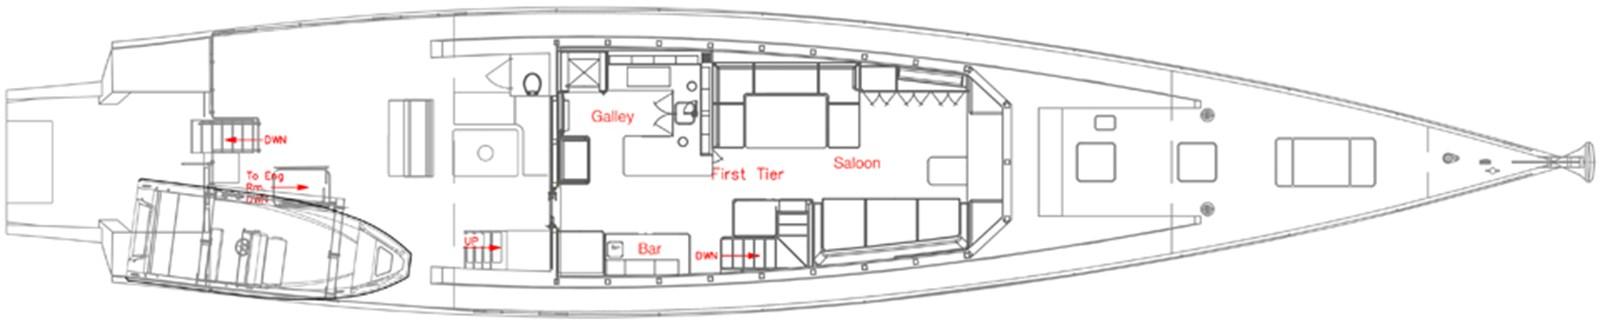 fpb-97-layout-1 2014 CIRCA MARINE FPB 97 Motor Yacht 2788453